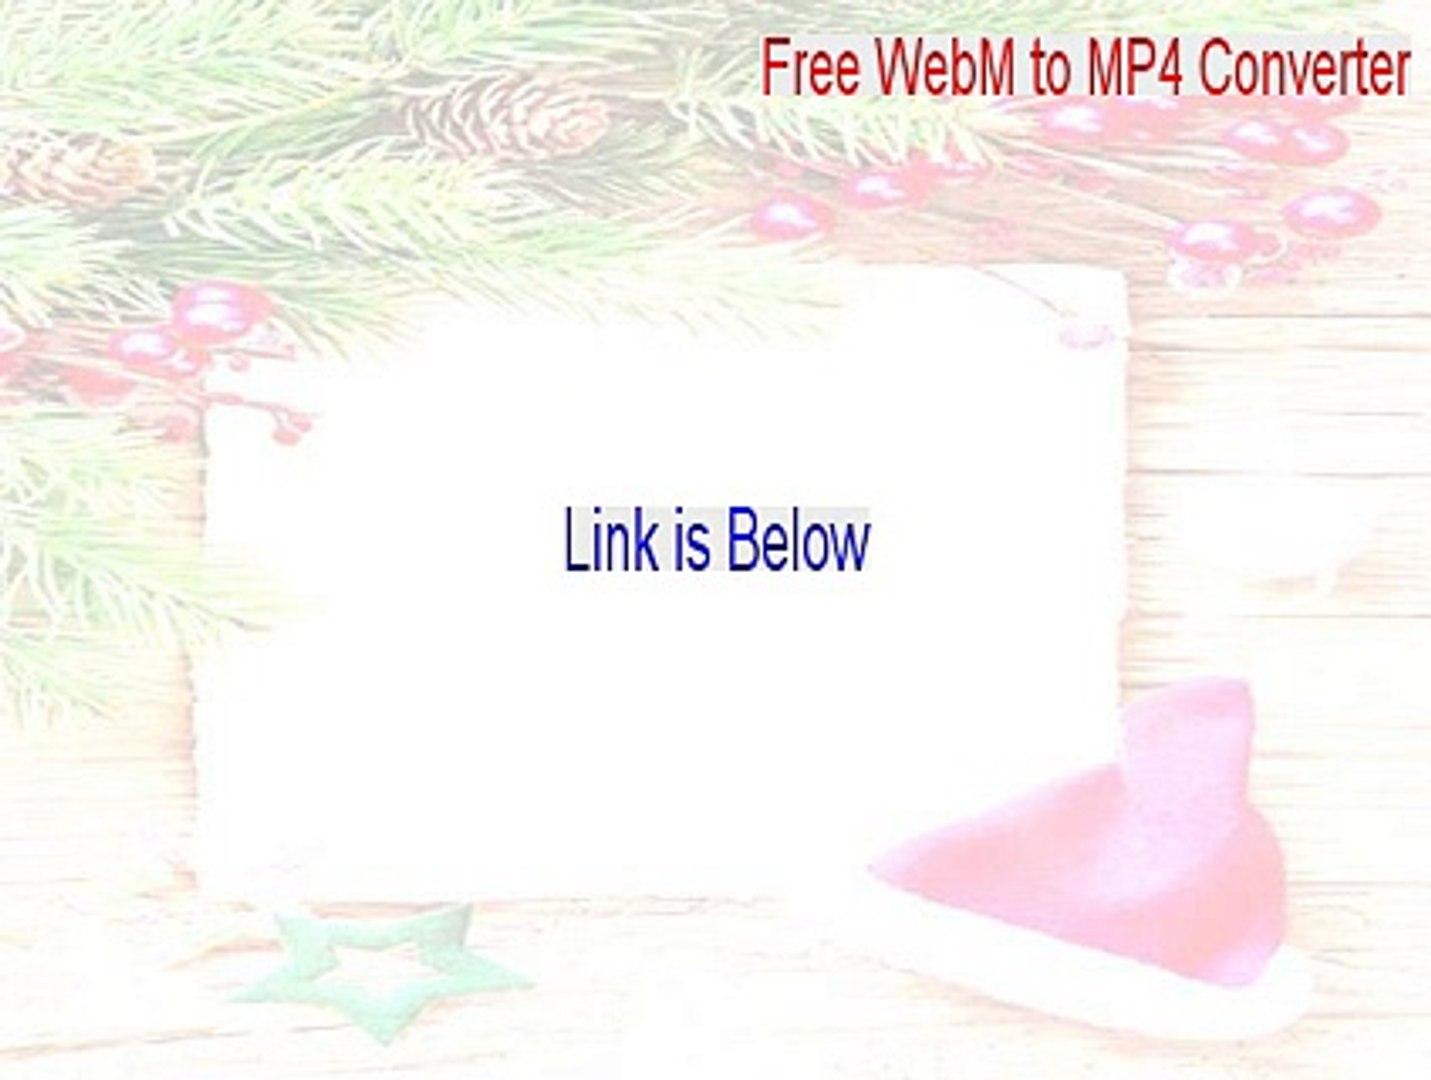 Free WebM to MP4 Converter Key Gen - webm file to mp4 converter free  download 2015